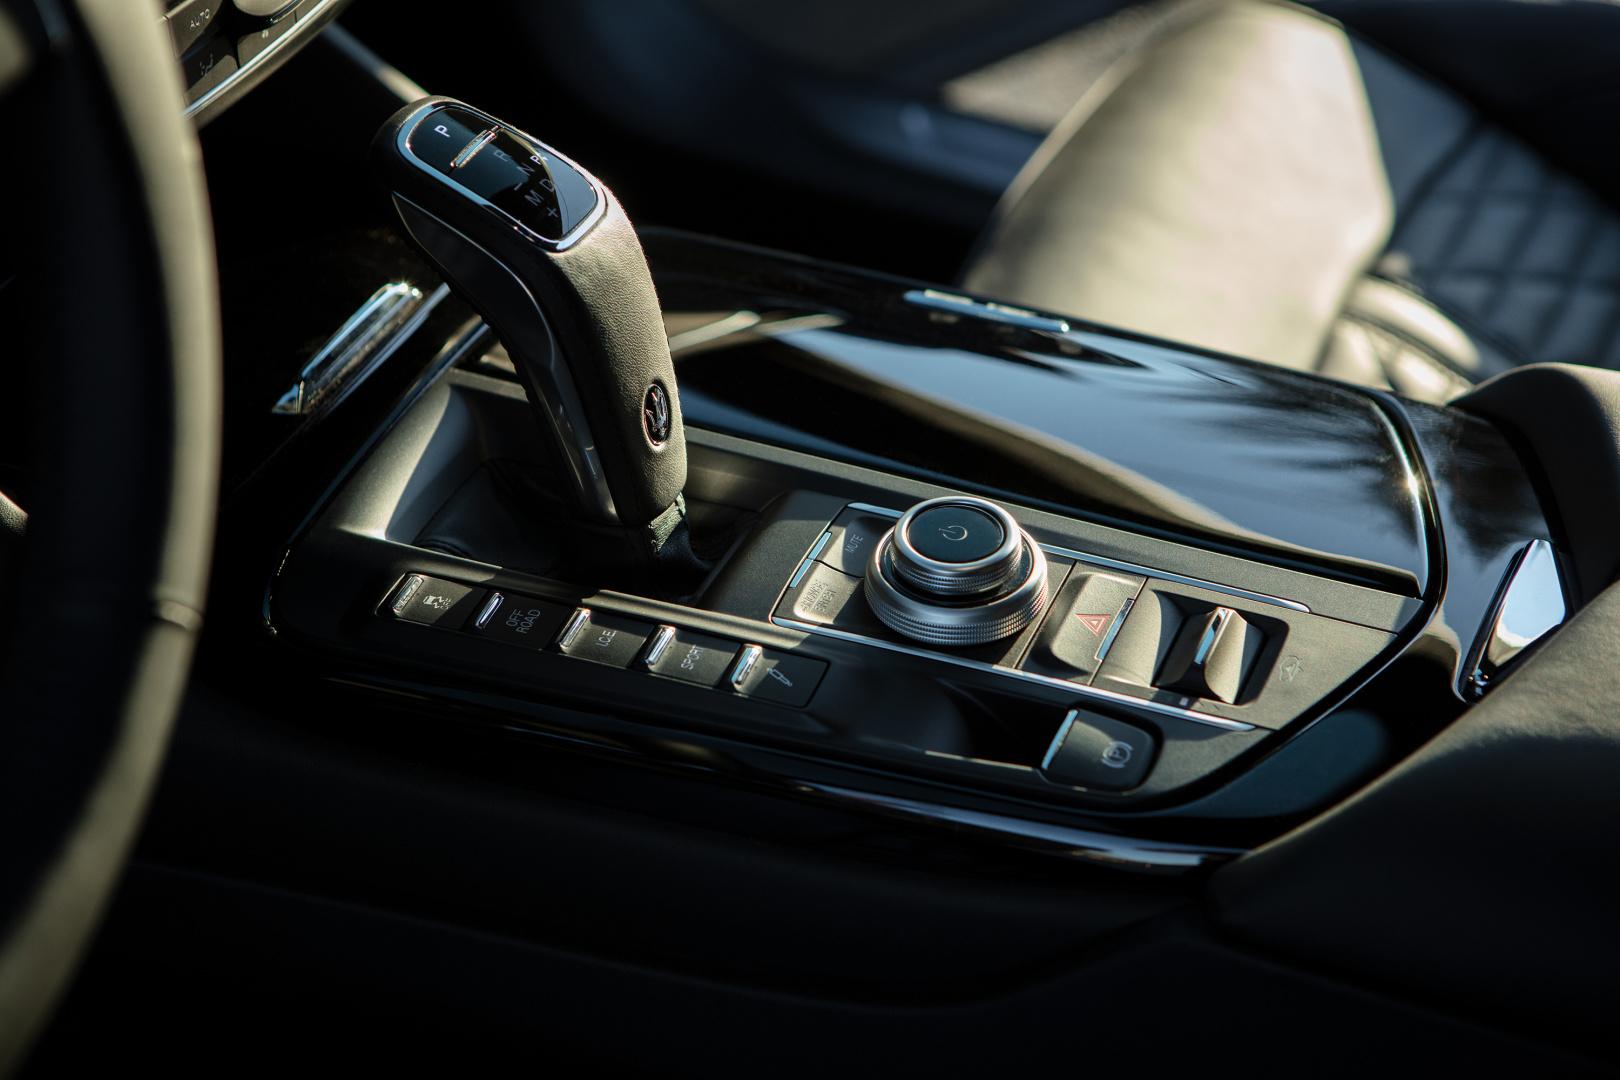 SMALL_17900-MaseratiLevanteHybrid